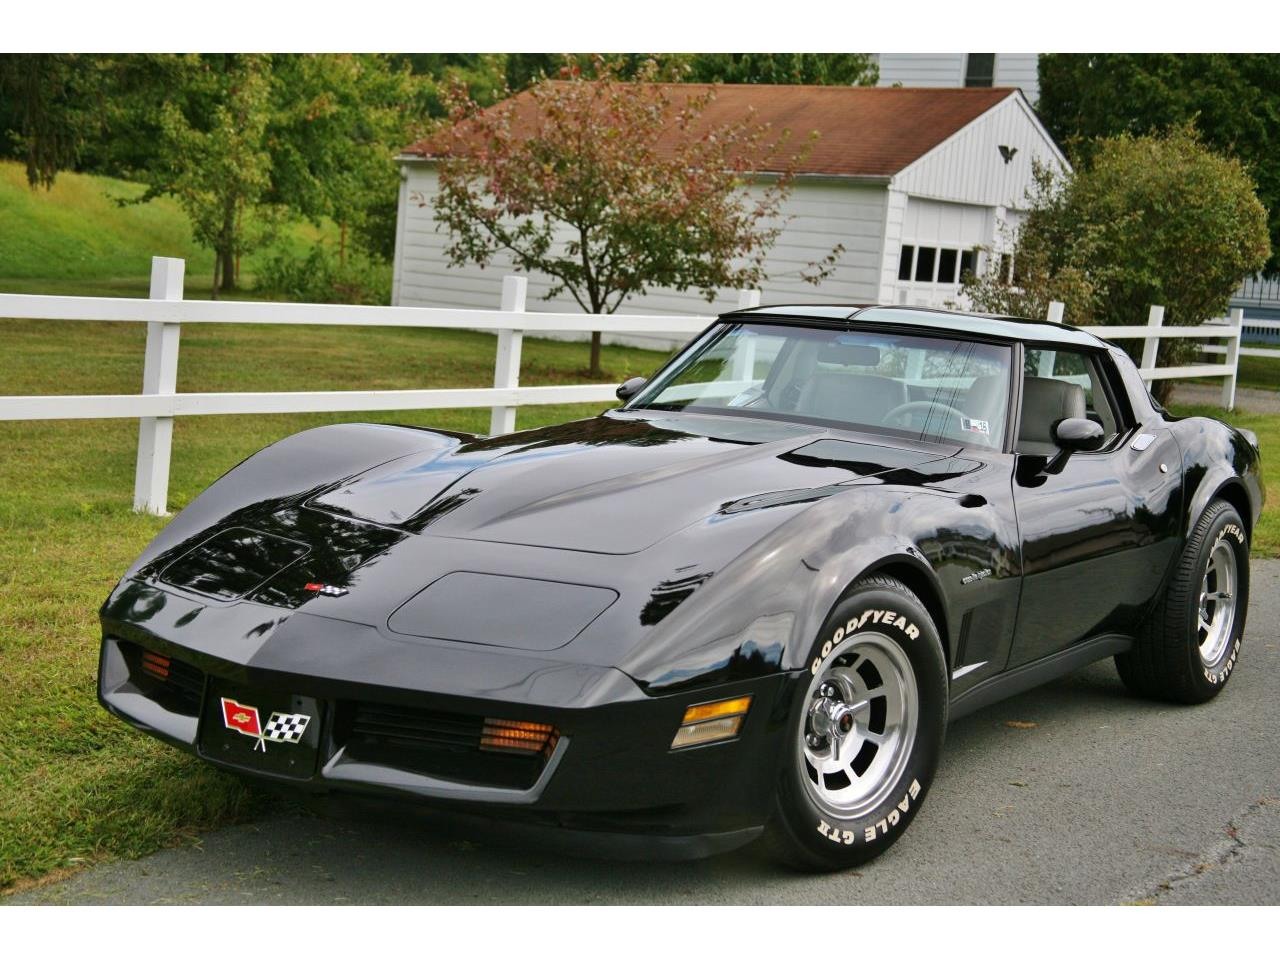 For Sale: 1982 Chevrolet Corvette in Old Forge, Pennsylvania